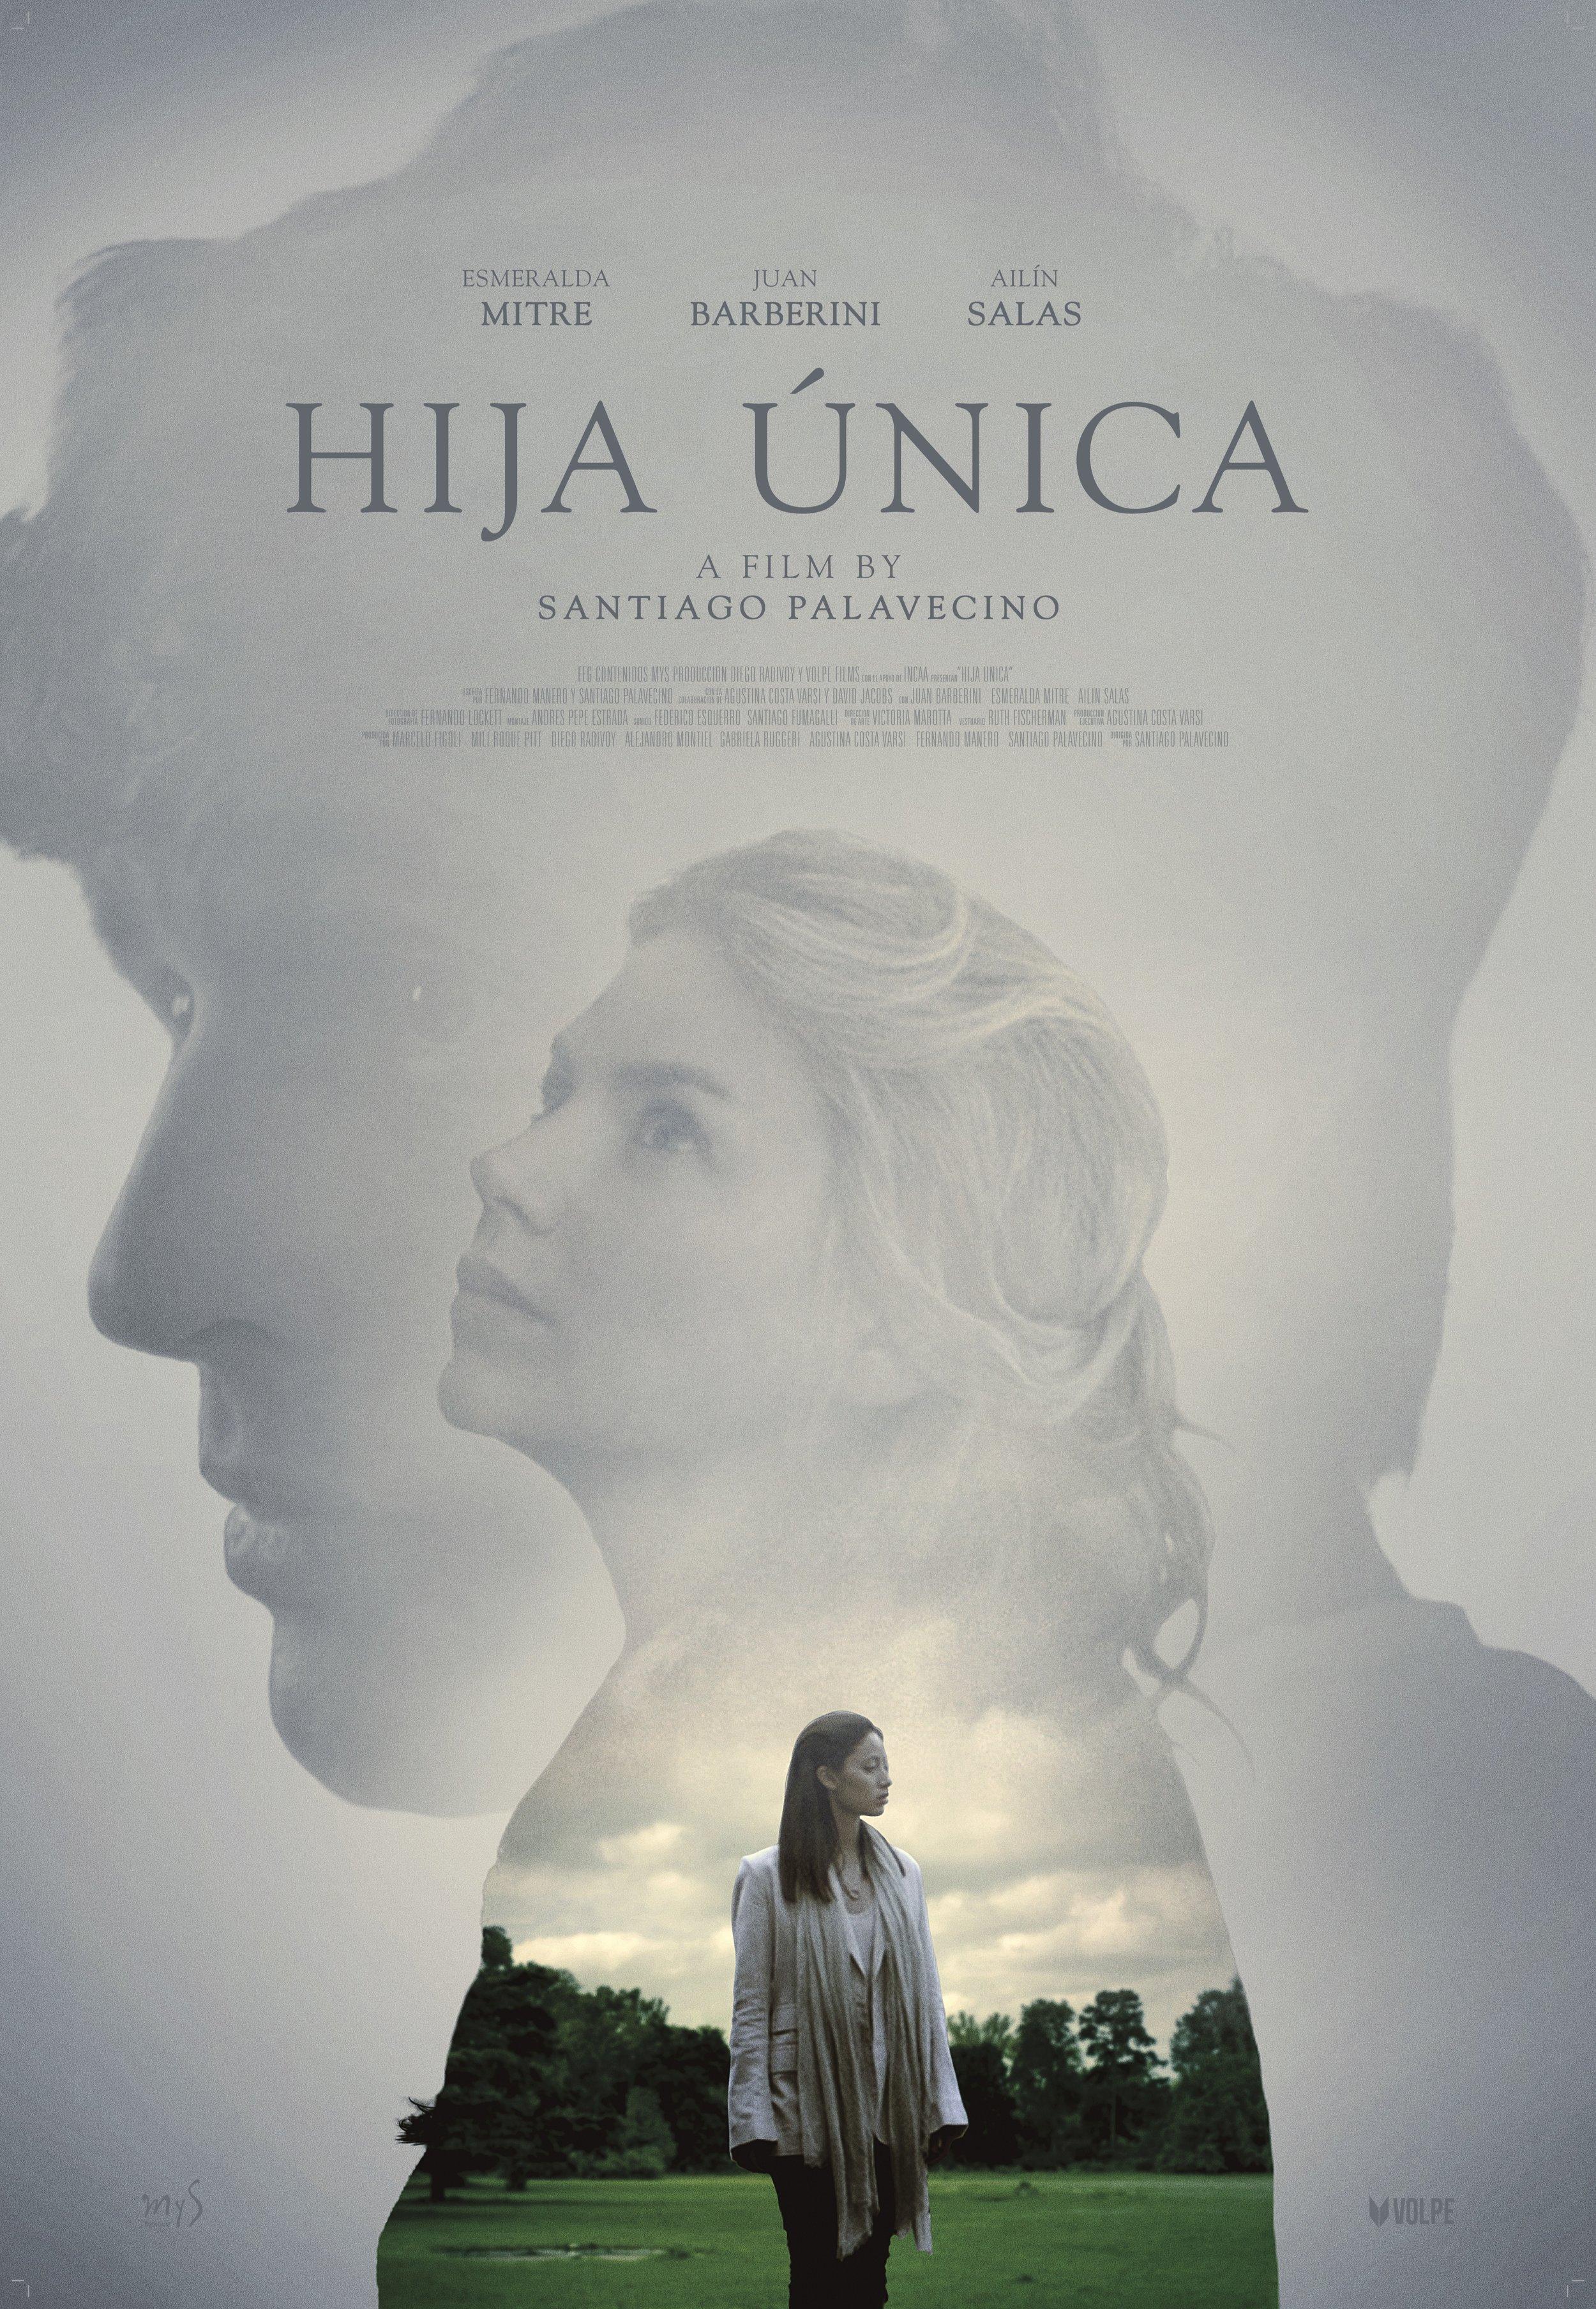 HijaUnica_poster_finish-2.jpg